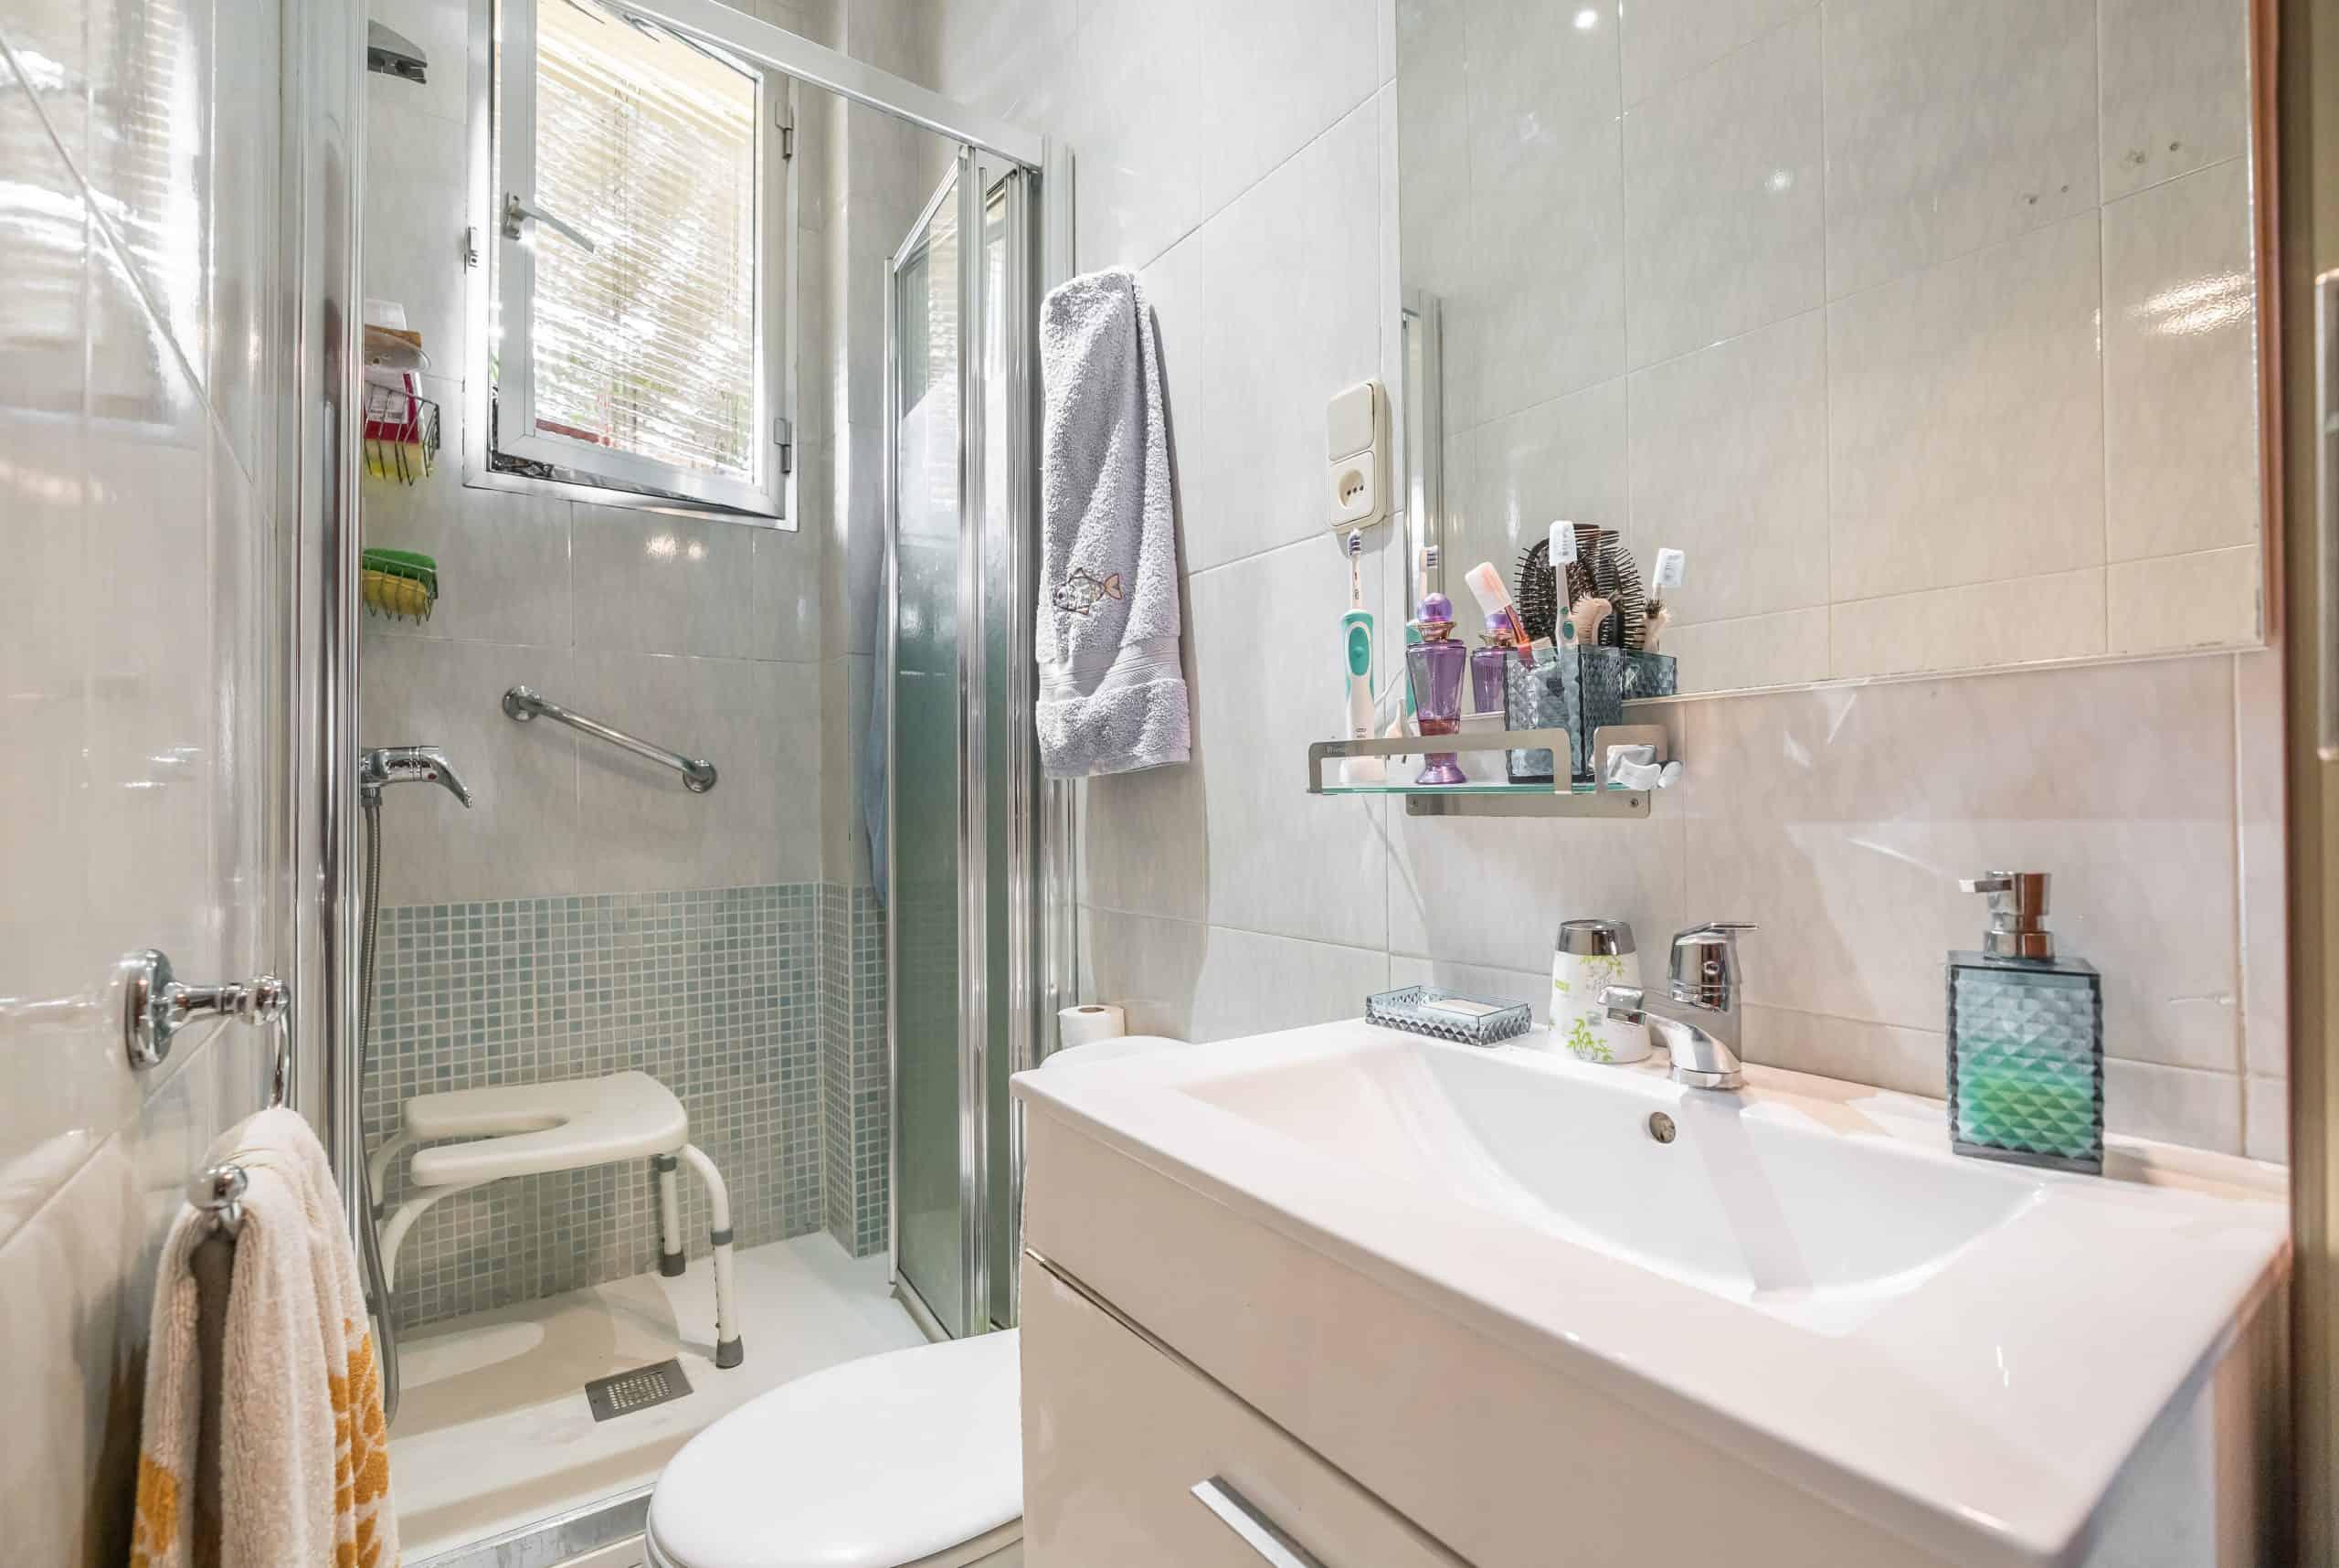 Agencia Inmobiliaria de Madrid-FUTUROCASA-Zona ARGANZUELA-EMBAJADORES-LEGAZPI3 BAÑO1 (1)